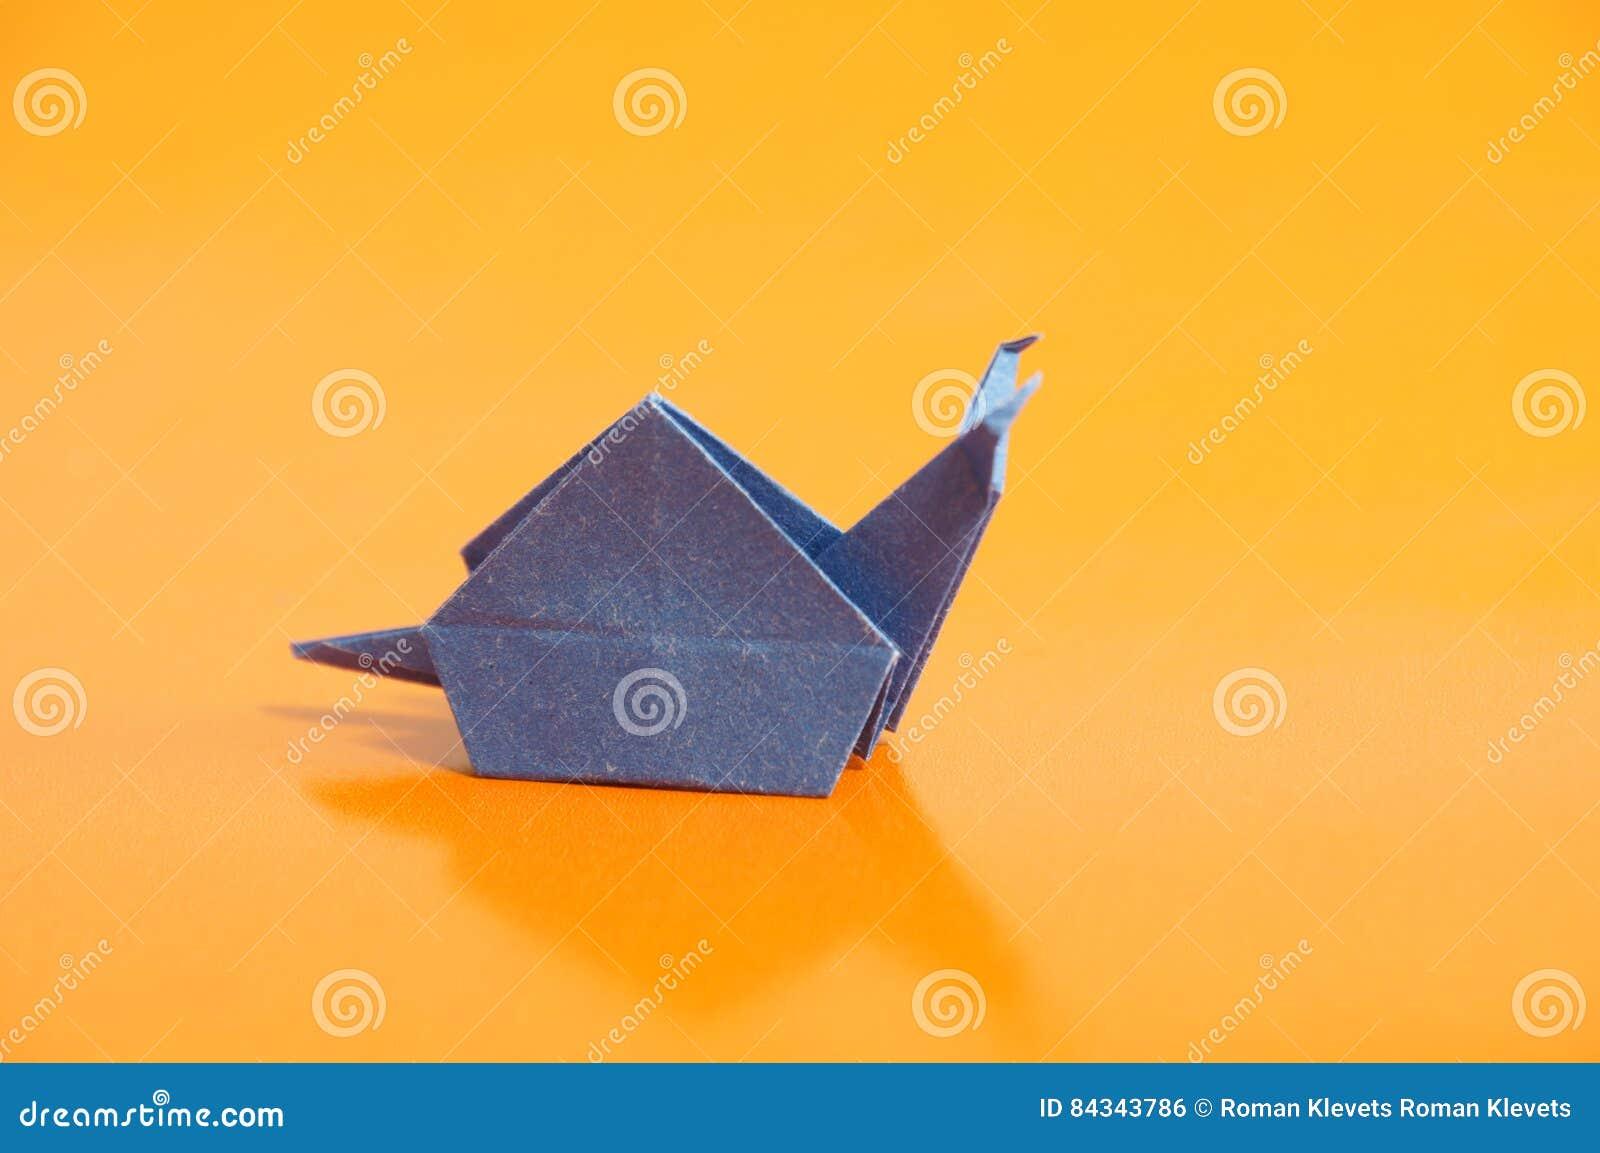 Contact us at Origami-Instructions.com | 954x1300